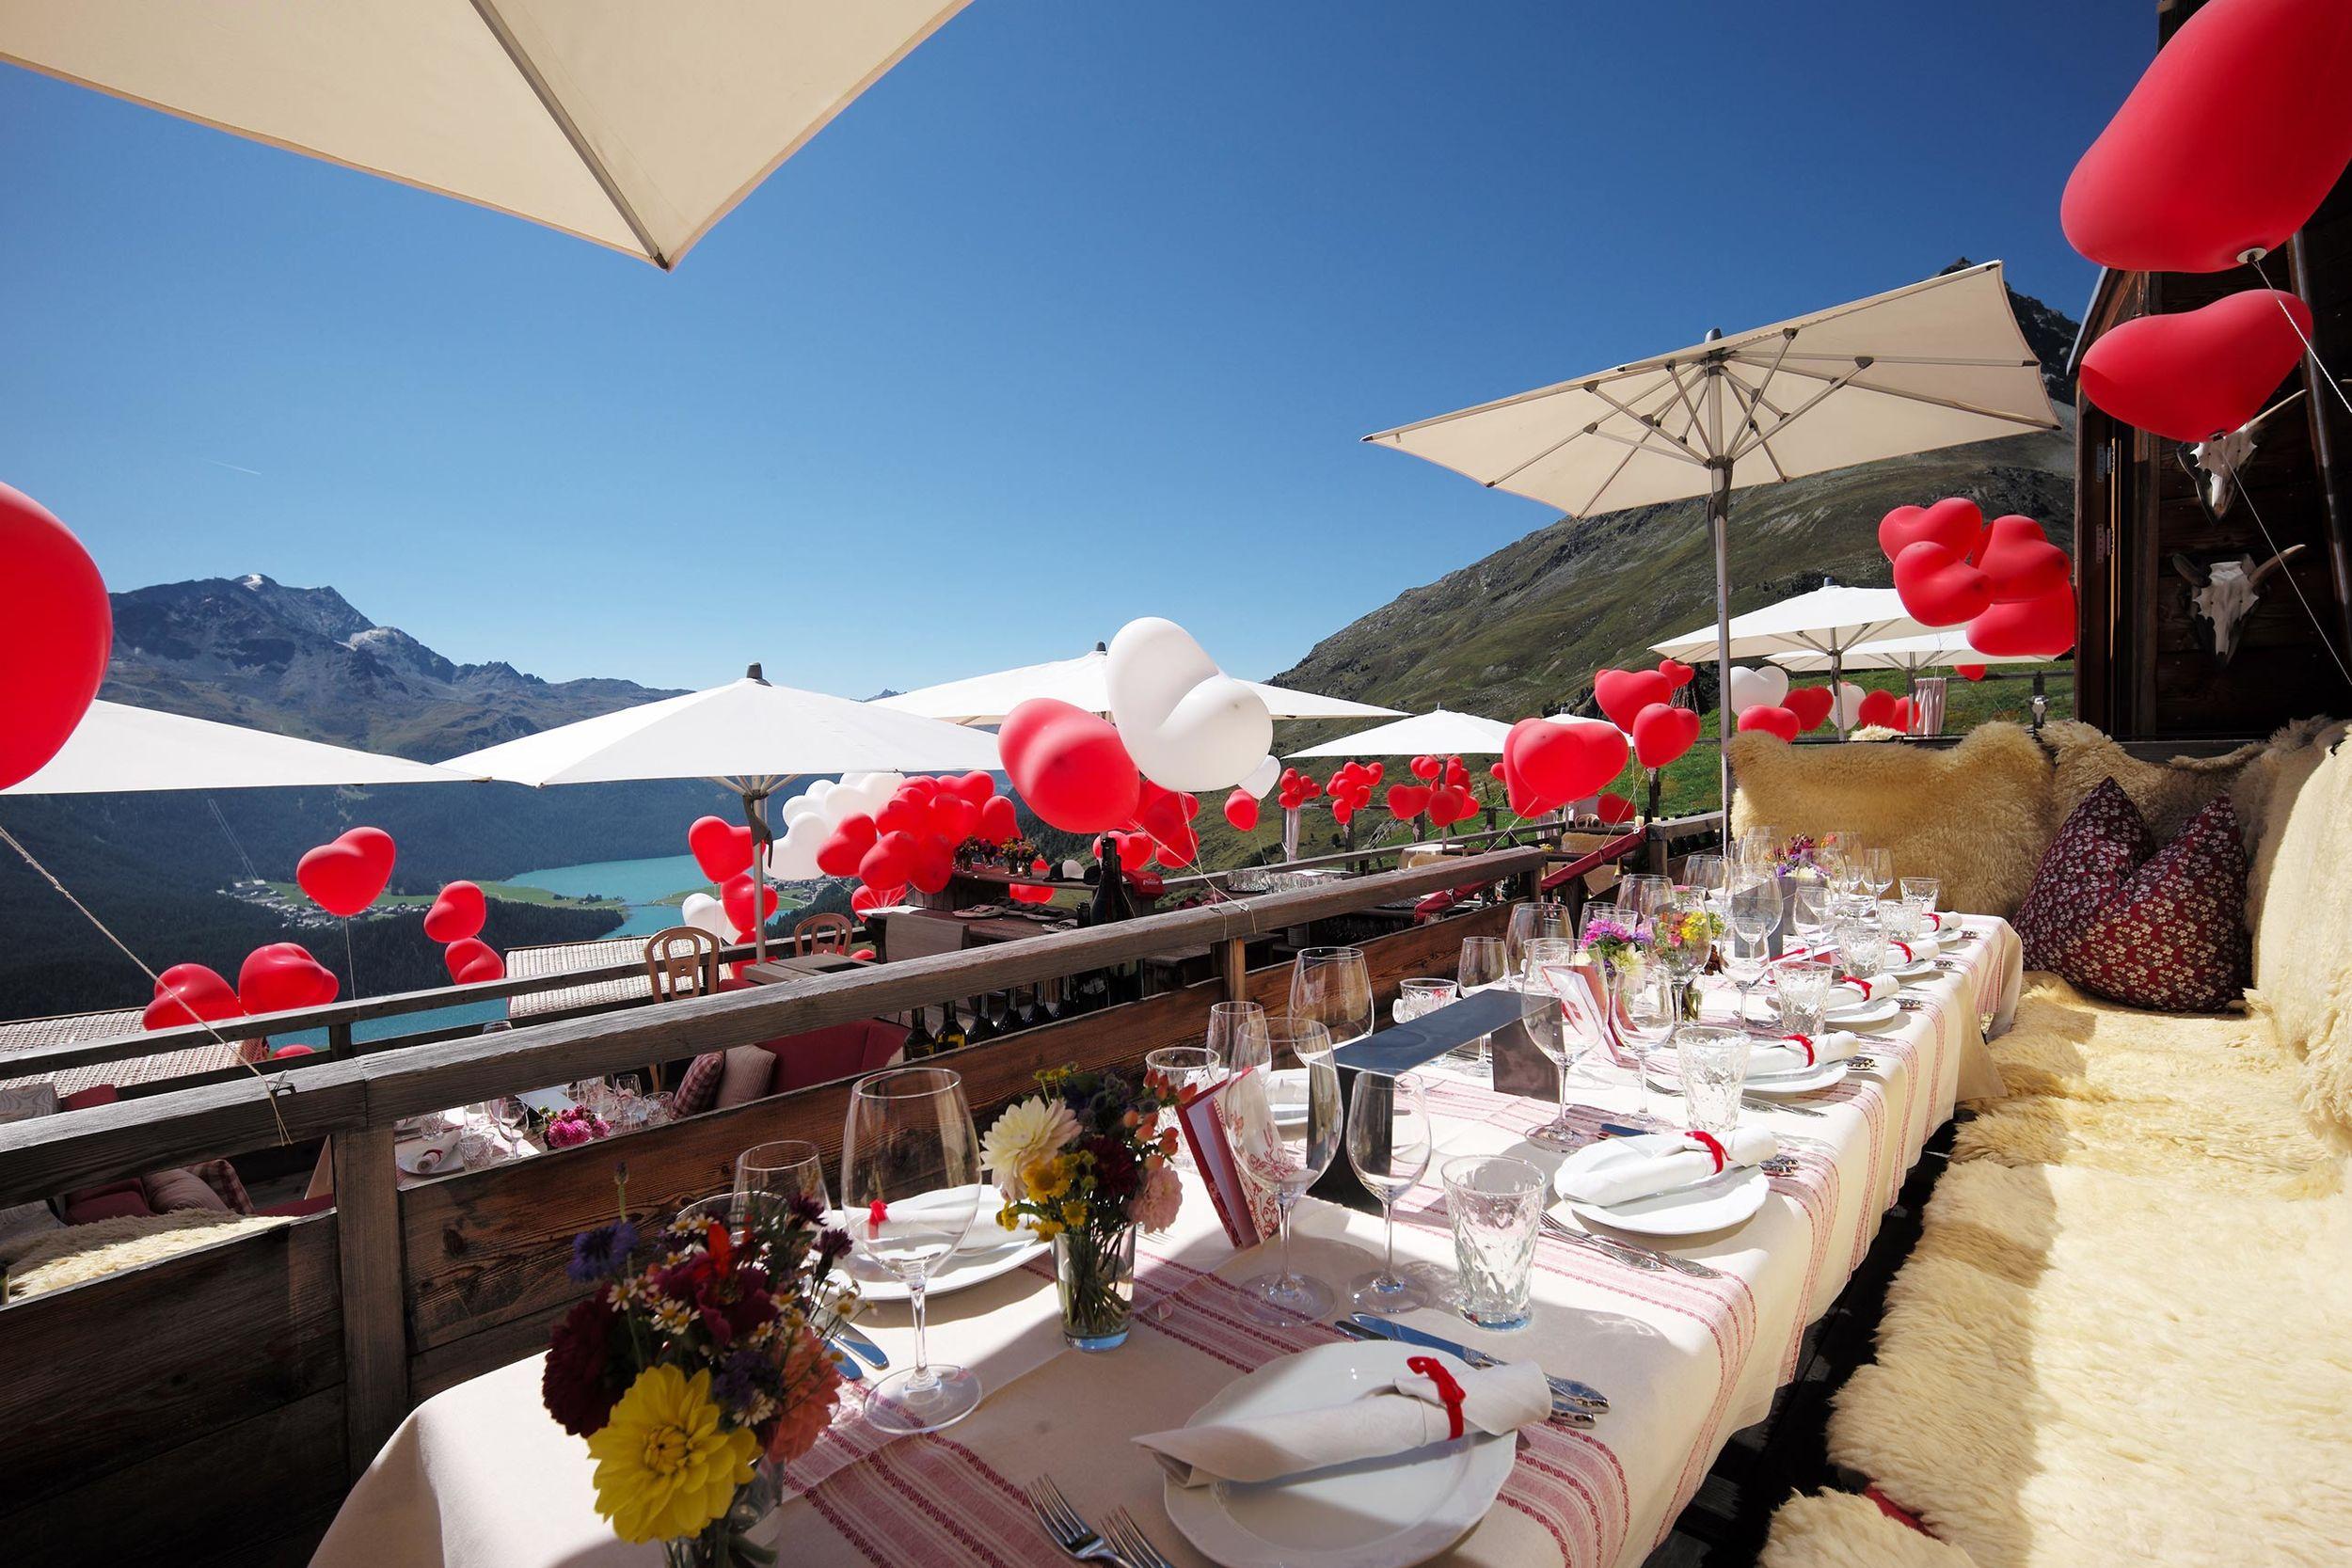 elparadiso-terrasse-stimmung2.jpg